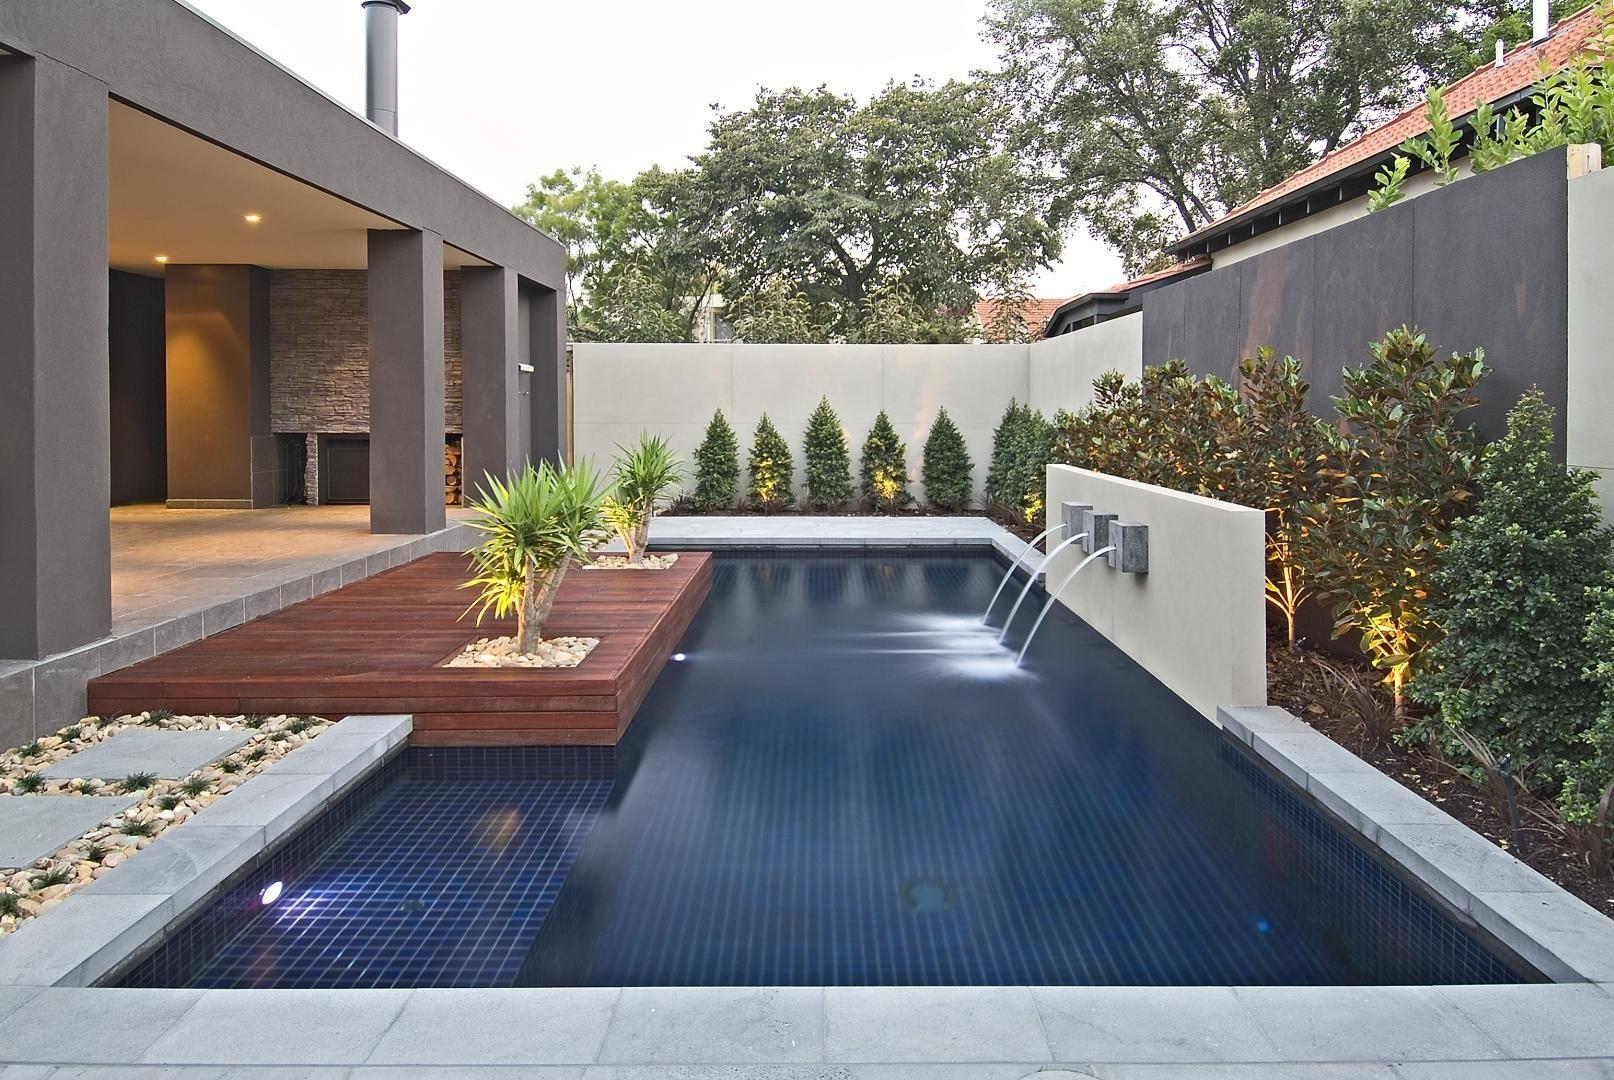 COS Design - Drake Street   Modern backyard, Modern pools ... on Modern Backyard Ideas With Pool id=32887